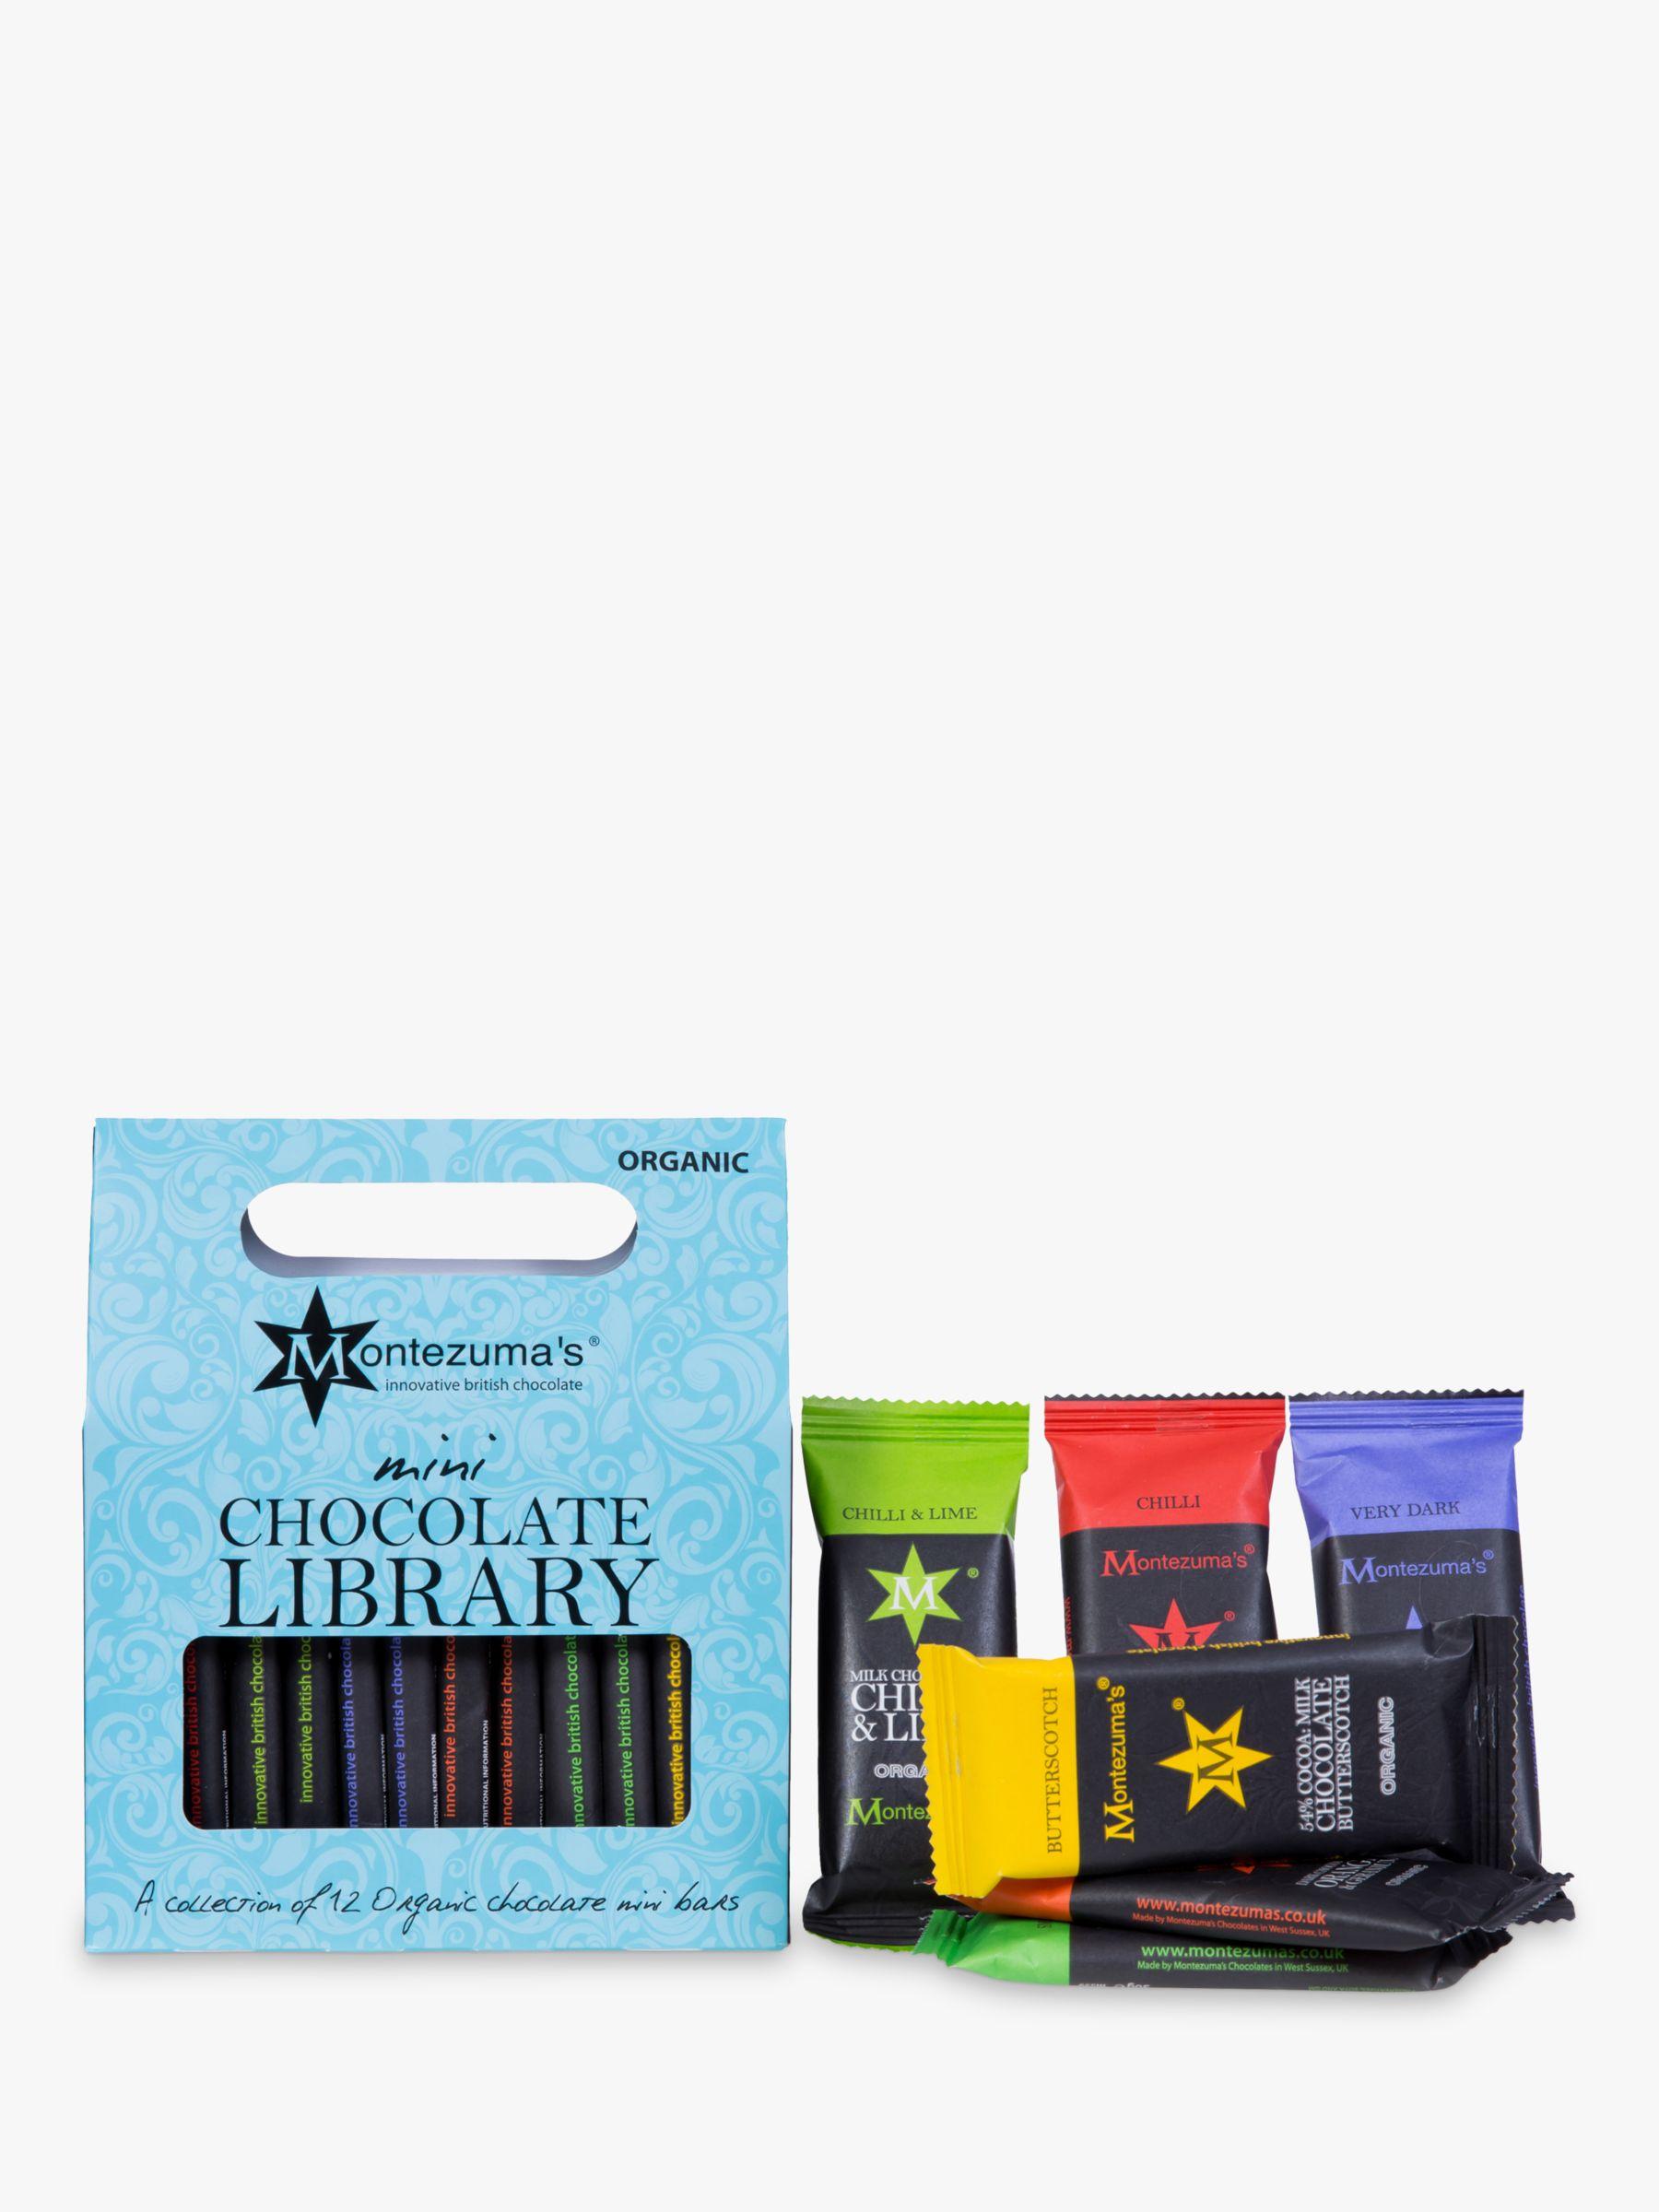 Montezuma's Montezuma's Mini Me Organic Chocolate Bar Library, 360g